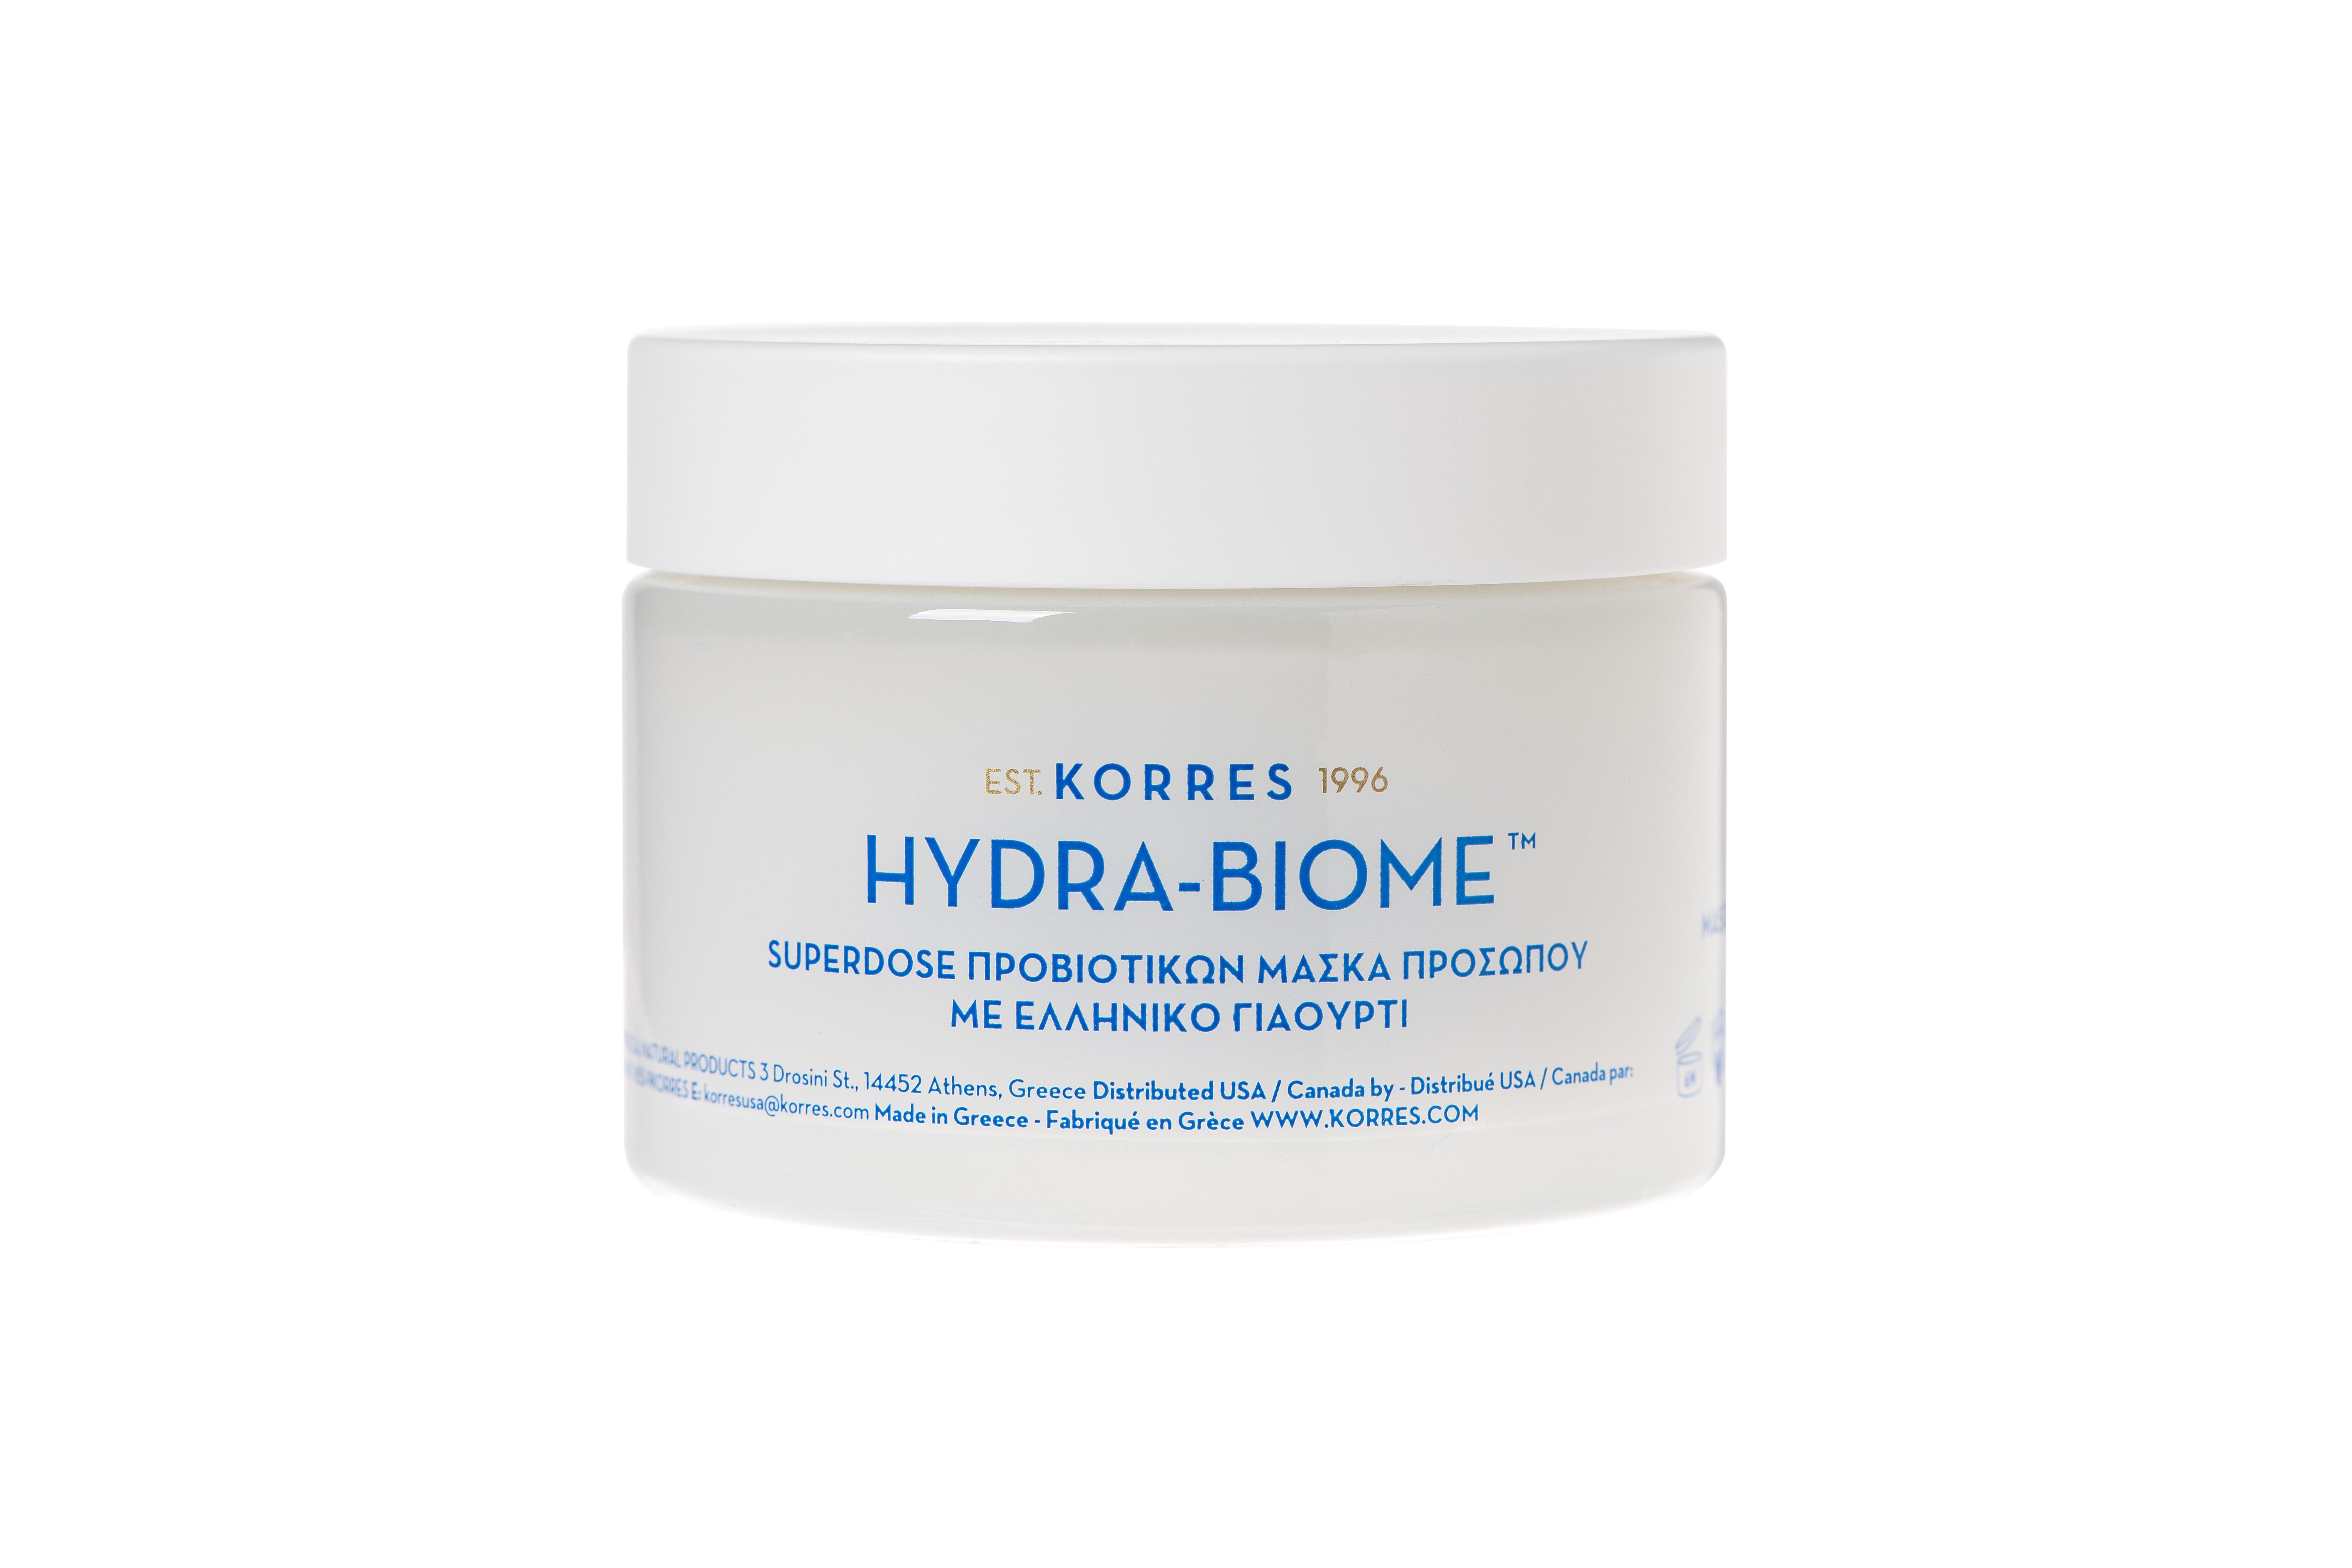 hydra-biome-superdose-1.jpg